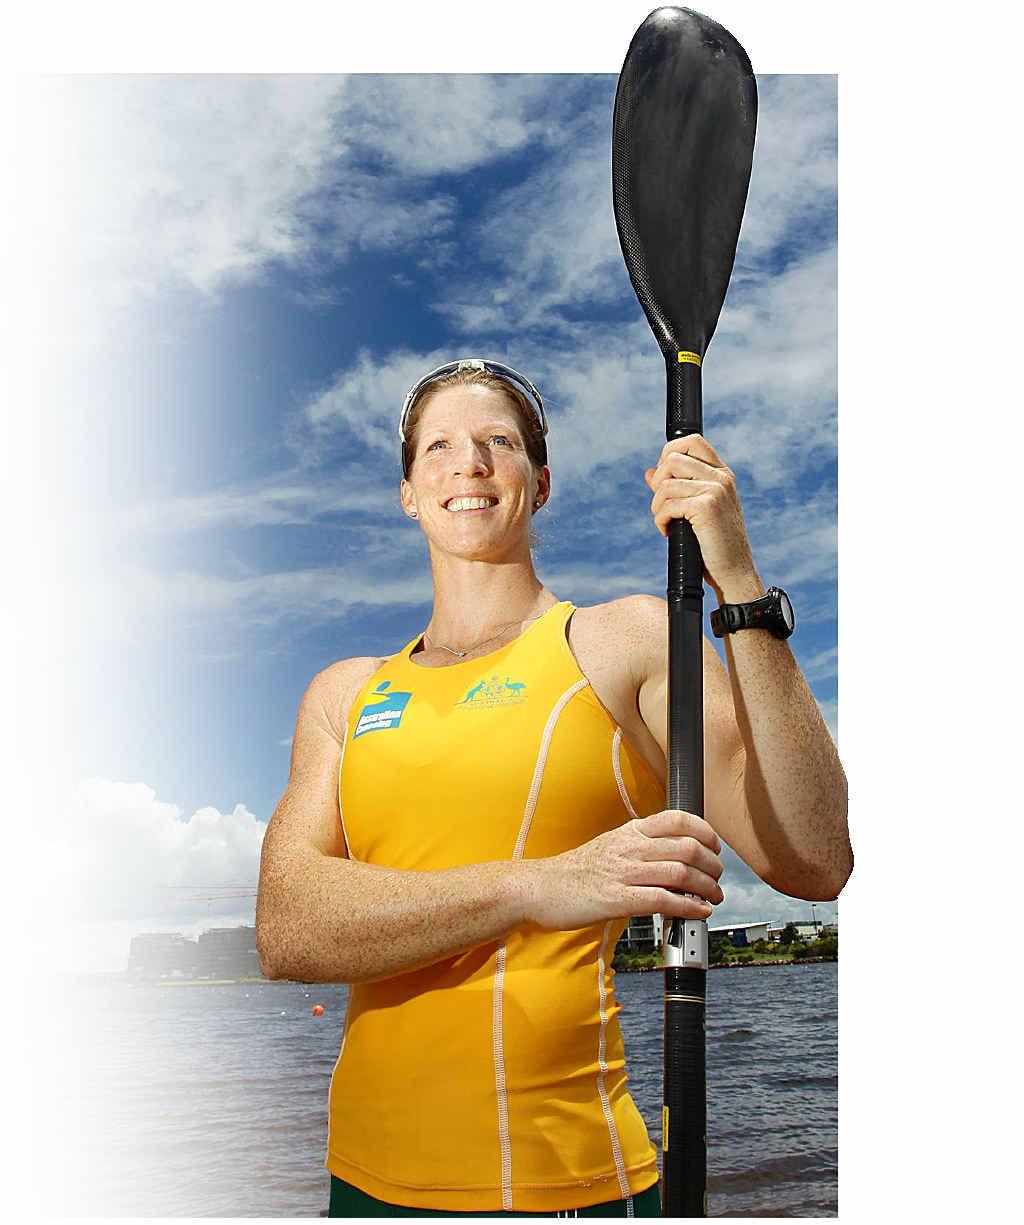 Rachel Lovell has set her sights on a gold medal.